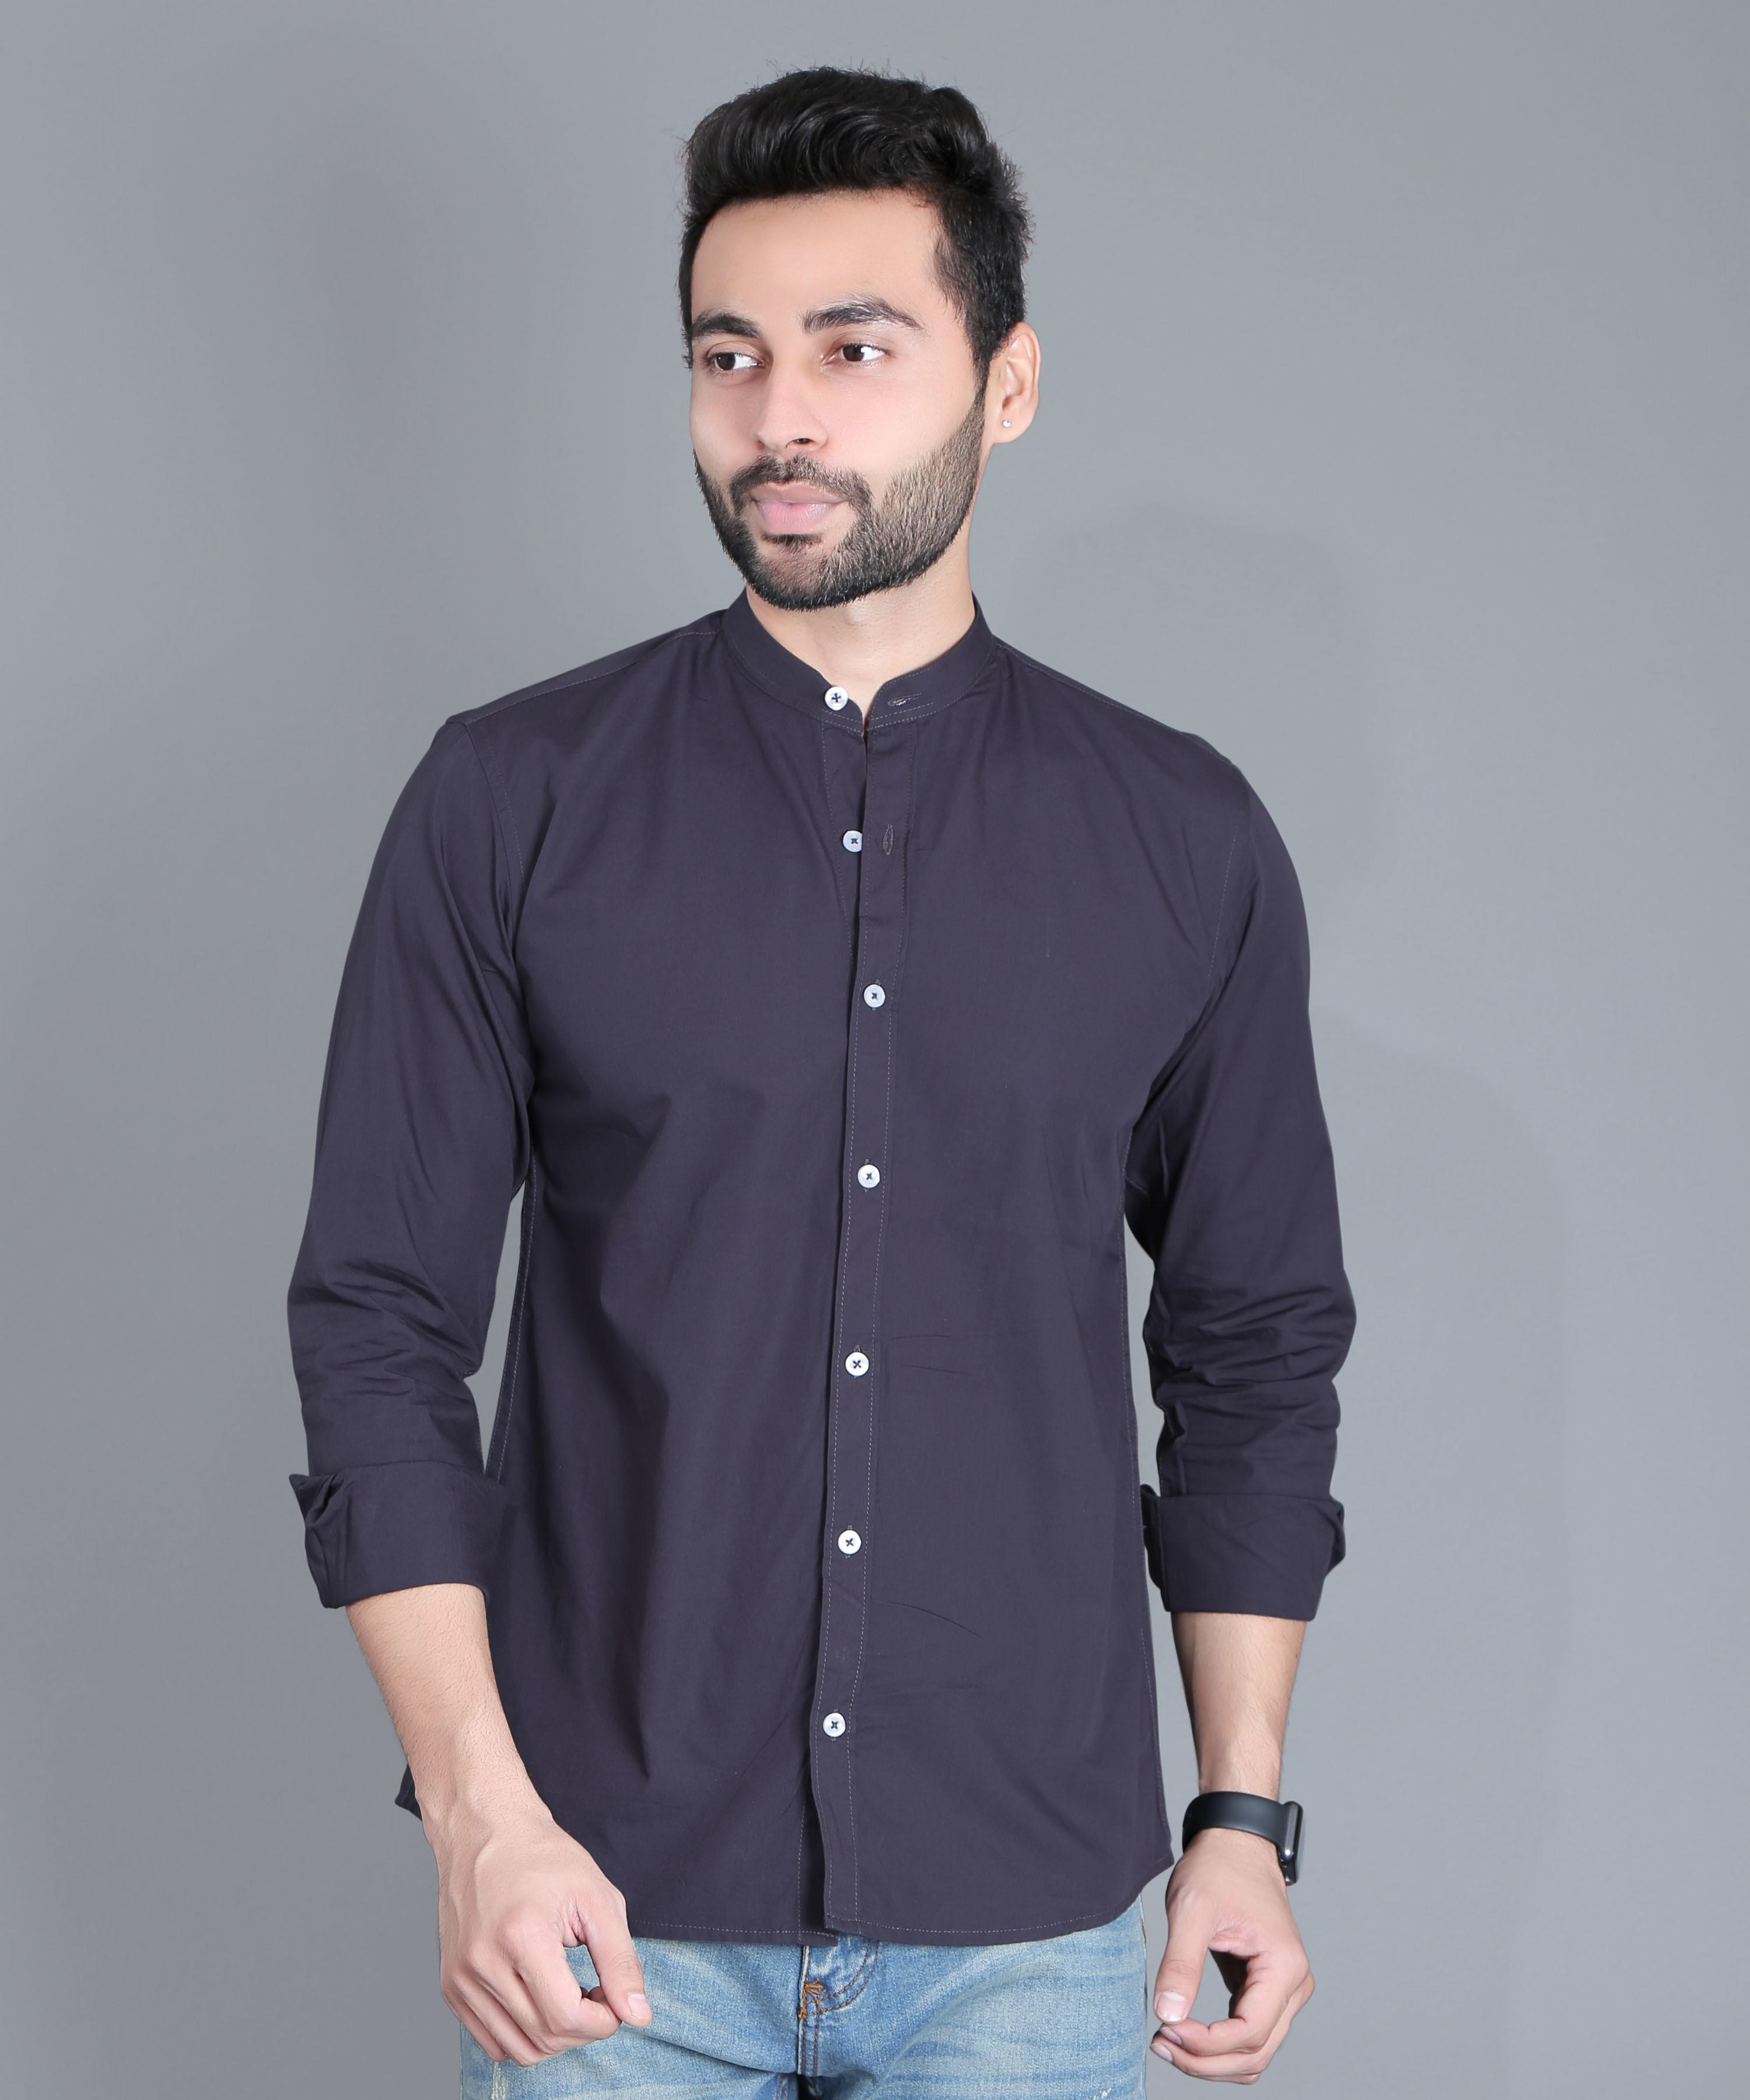 FIFTH ANFOLD Casual Mandrin Collar full Sleev/Long Sleev Dark Grey Pure Cotton Plain Solid Men Shirt